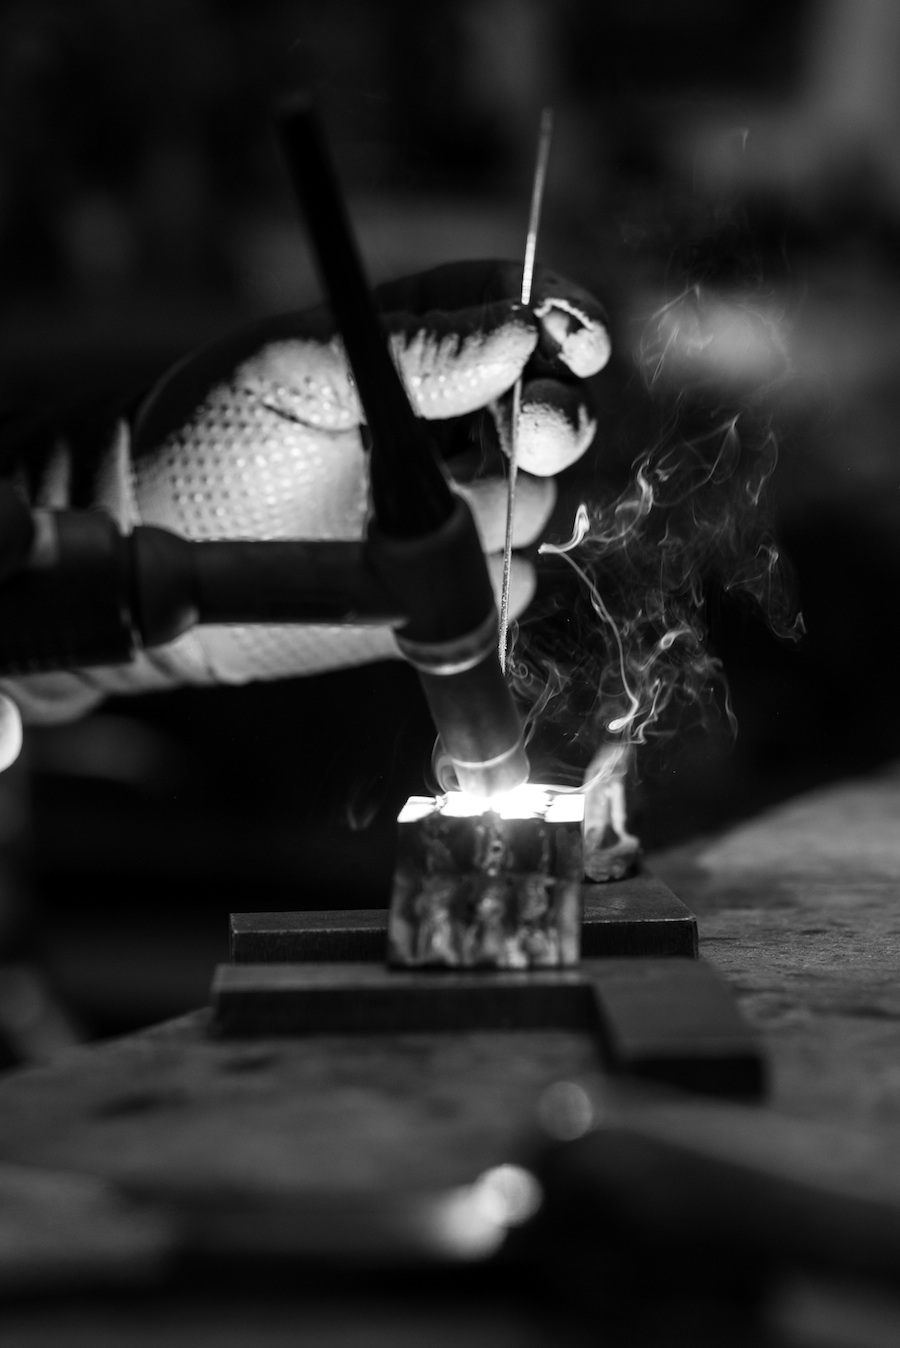 octobon-jean-atelier-34.jpg